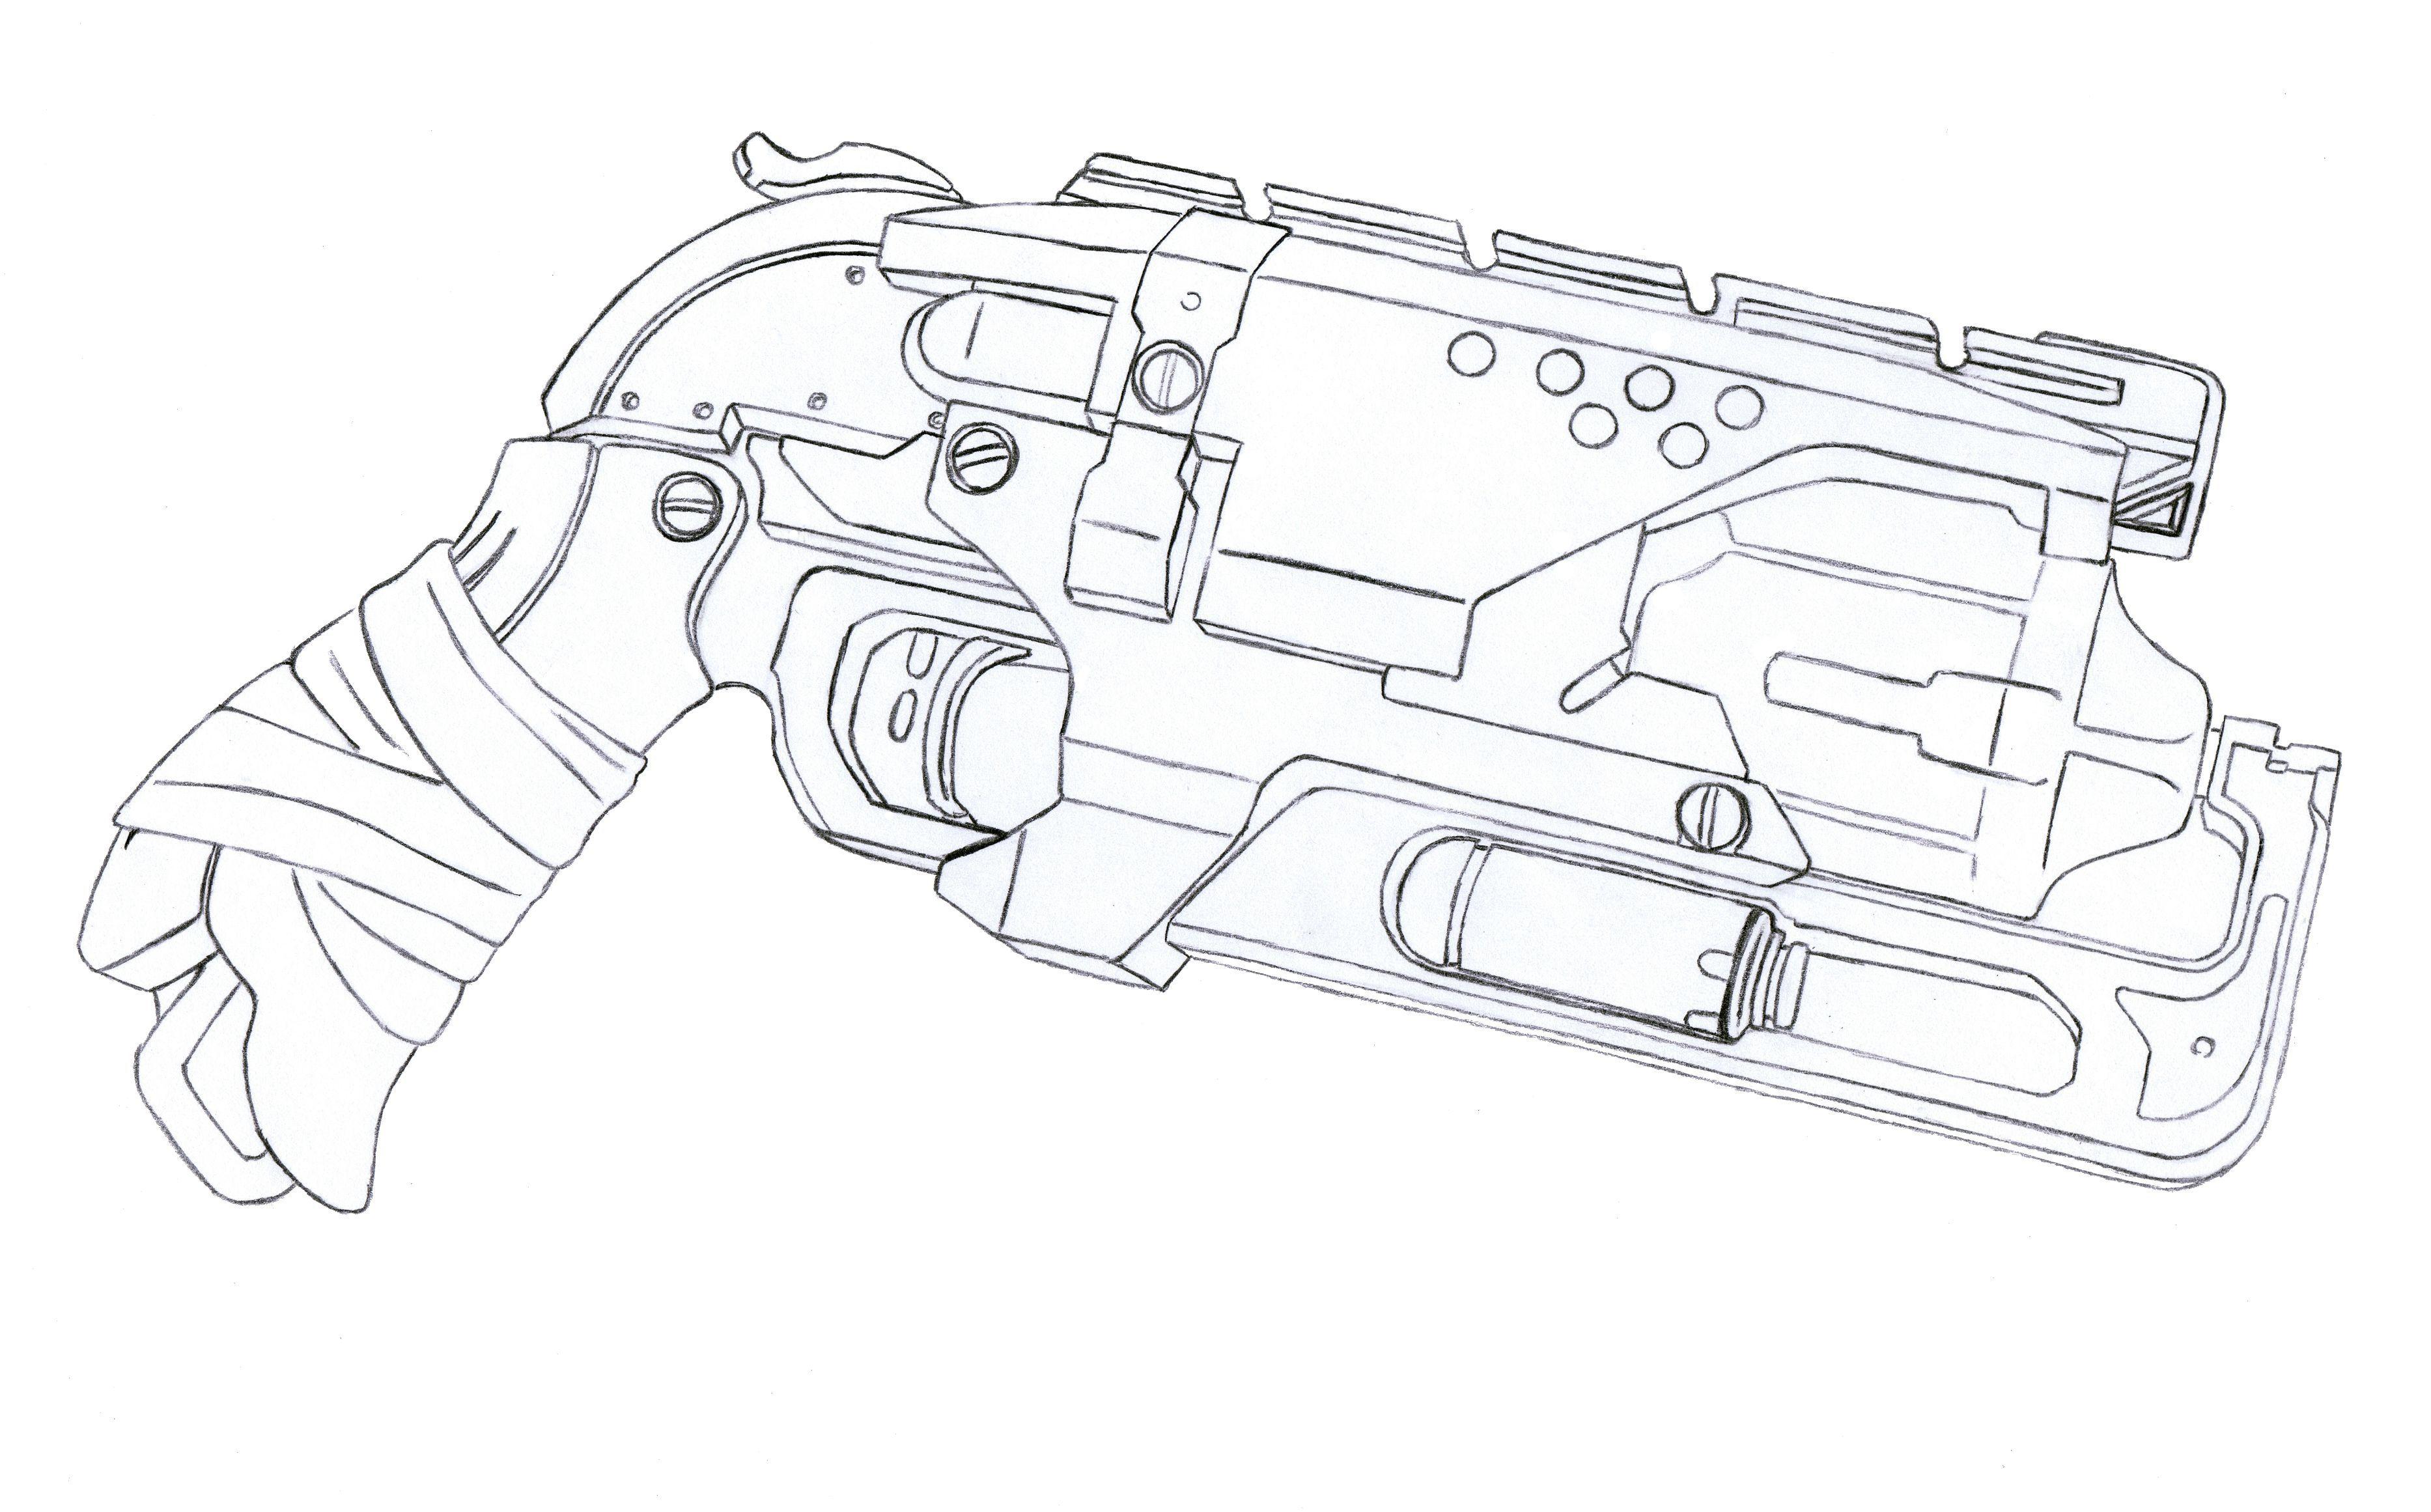 Cool Looking Guns